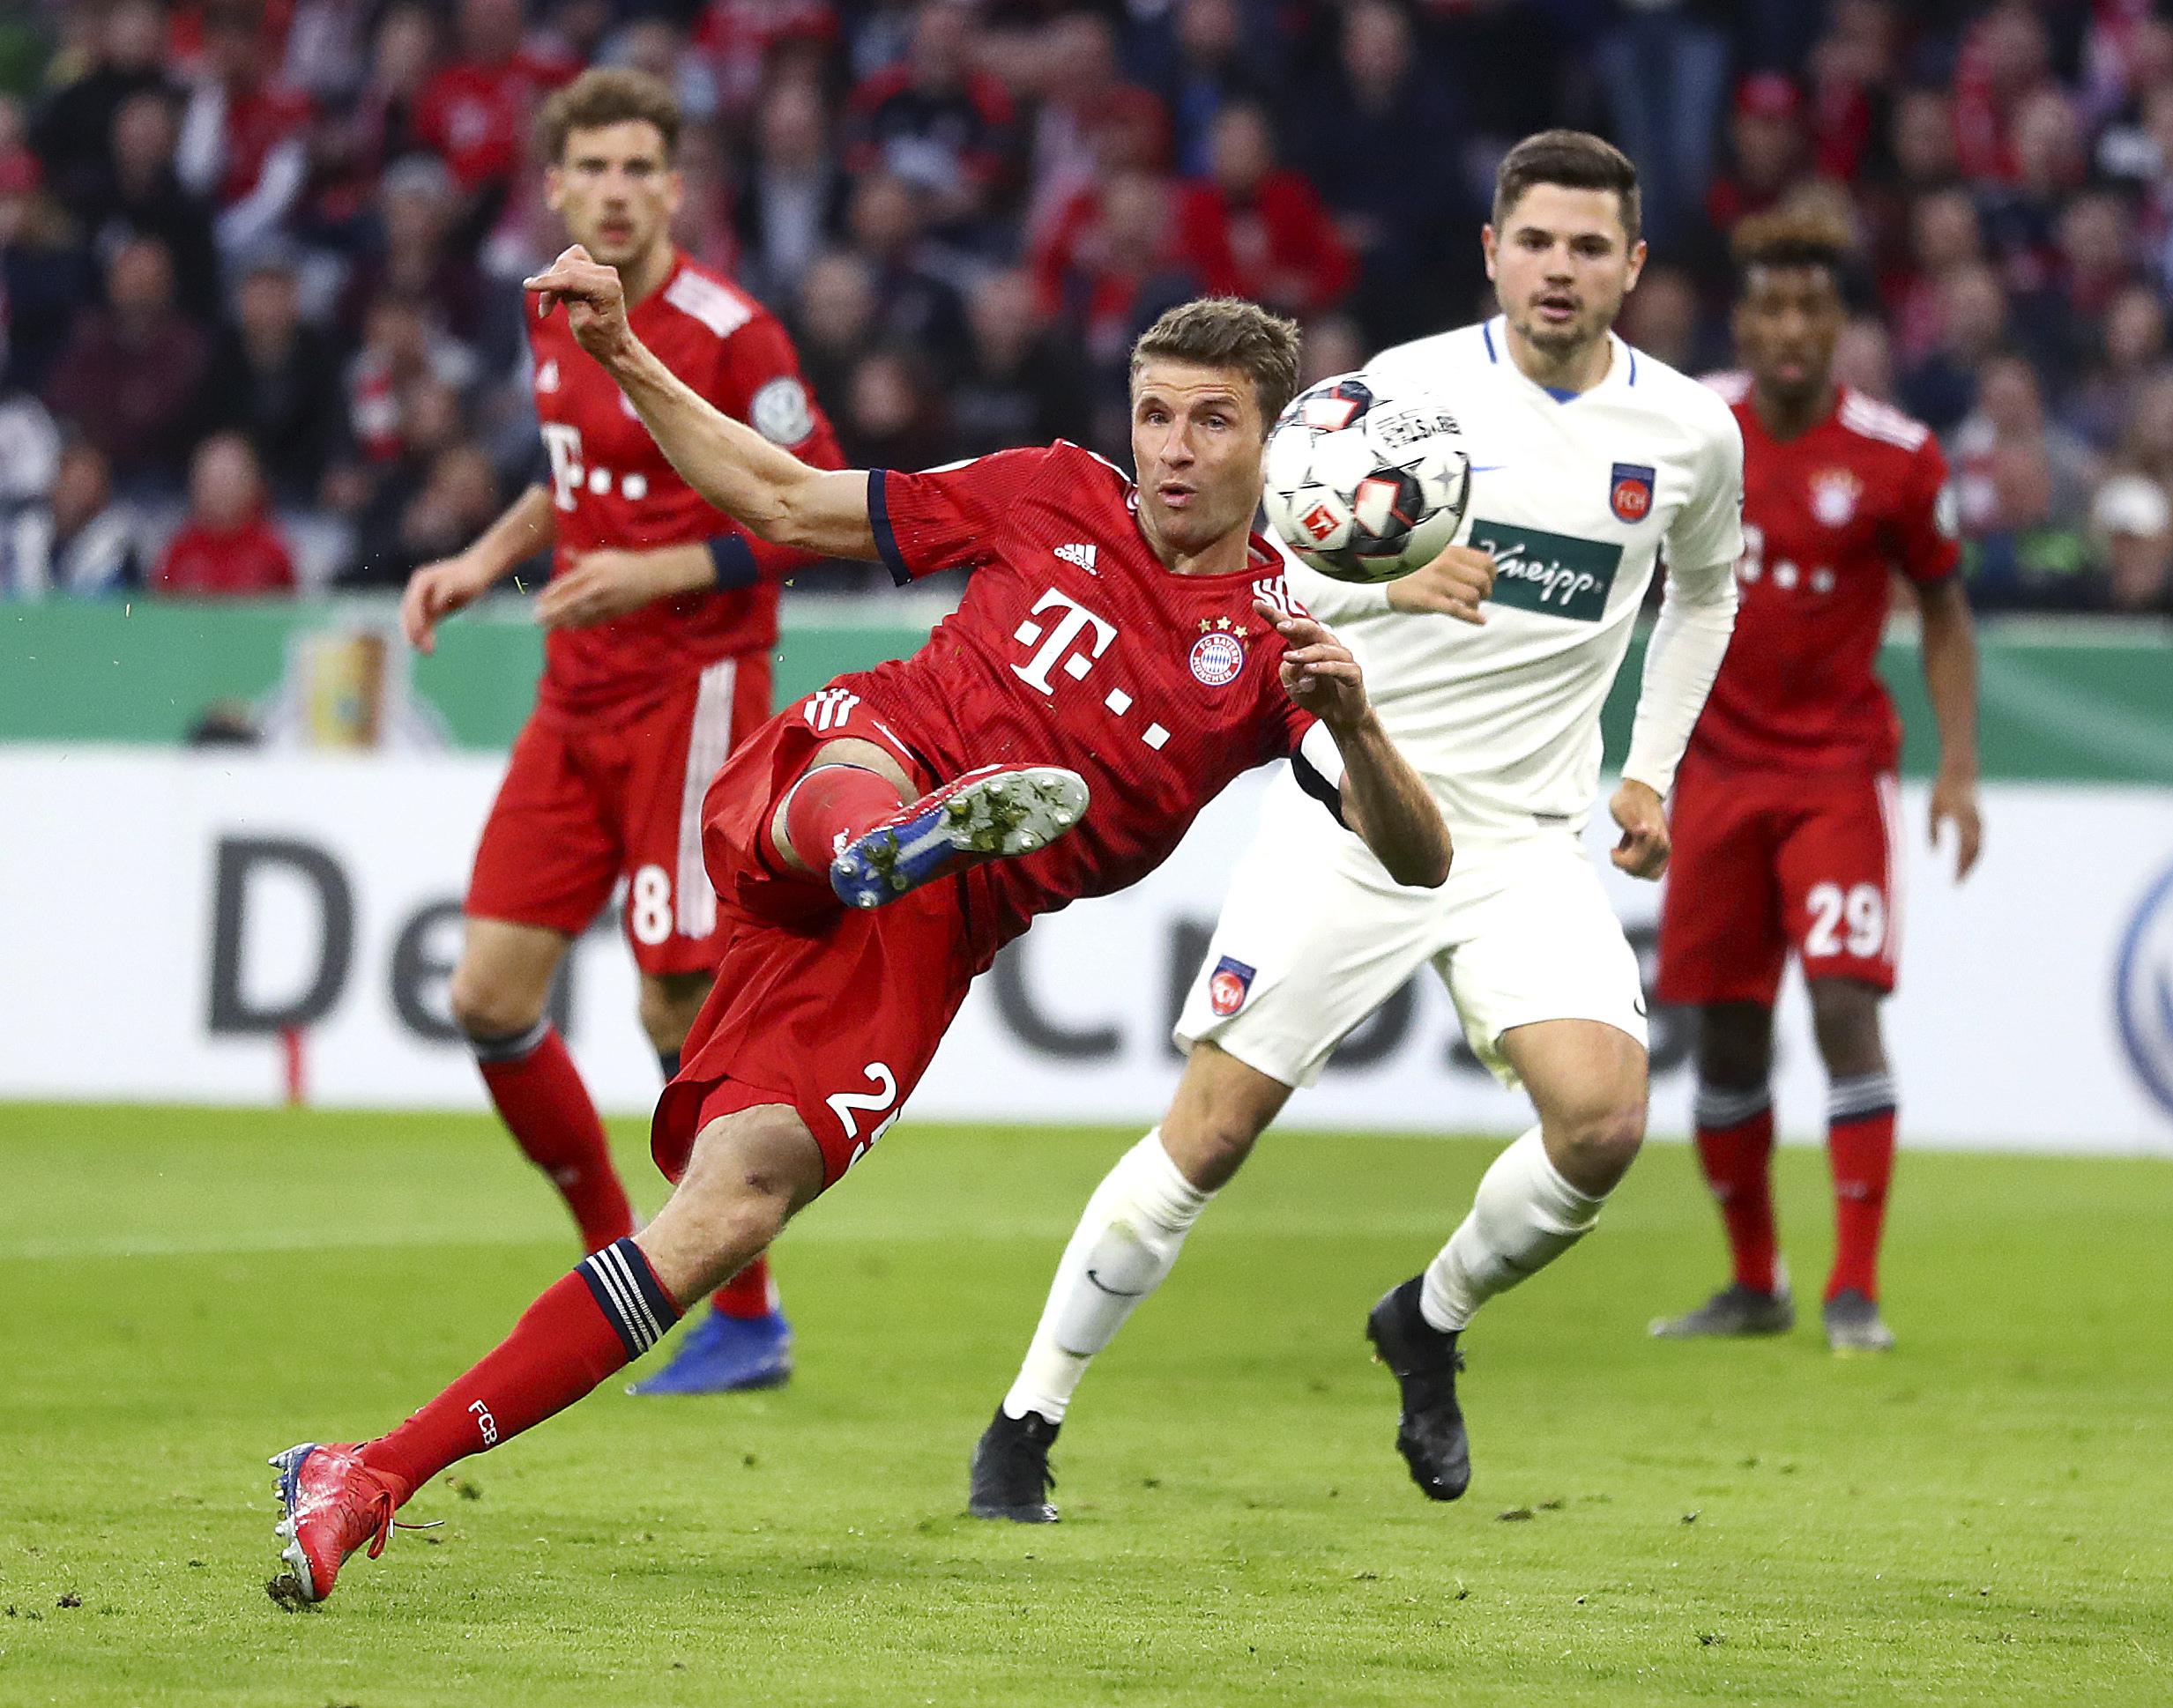 Lewandowski saves Bayern in 5-4 Cup win vs. Heidenheim